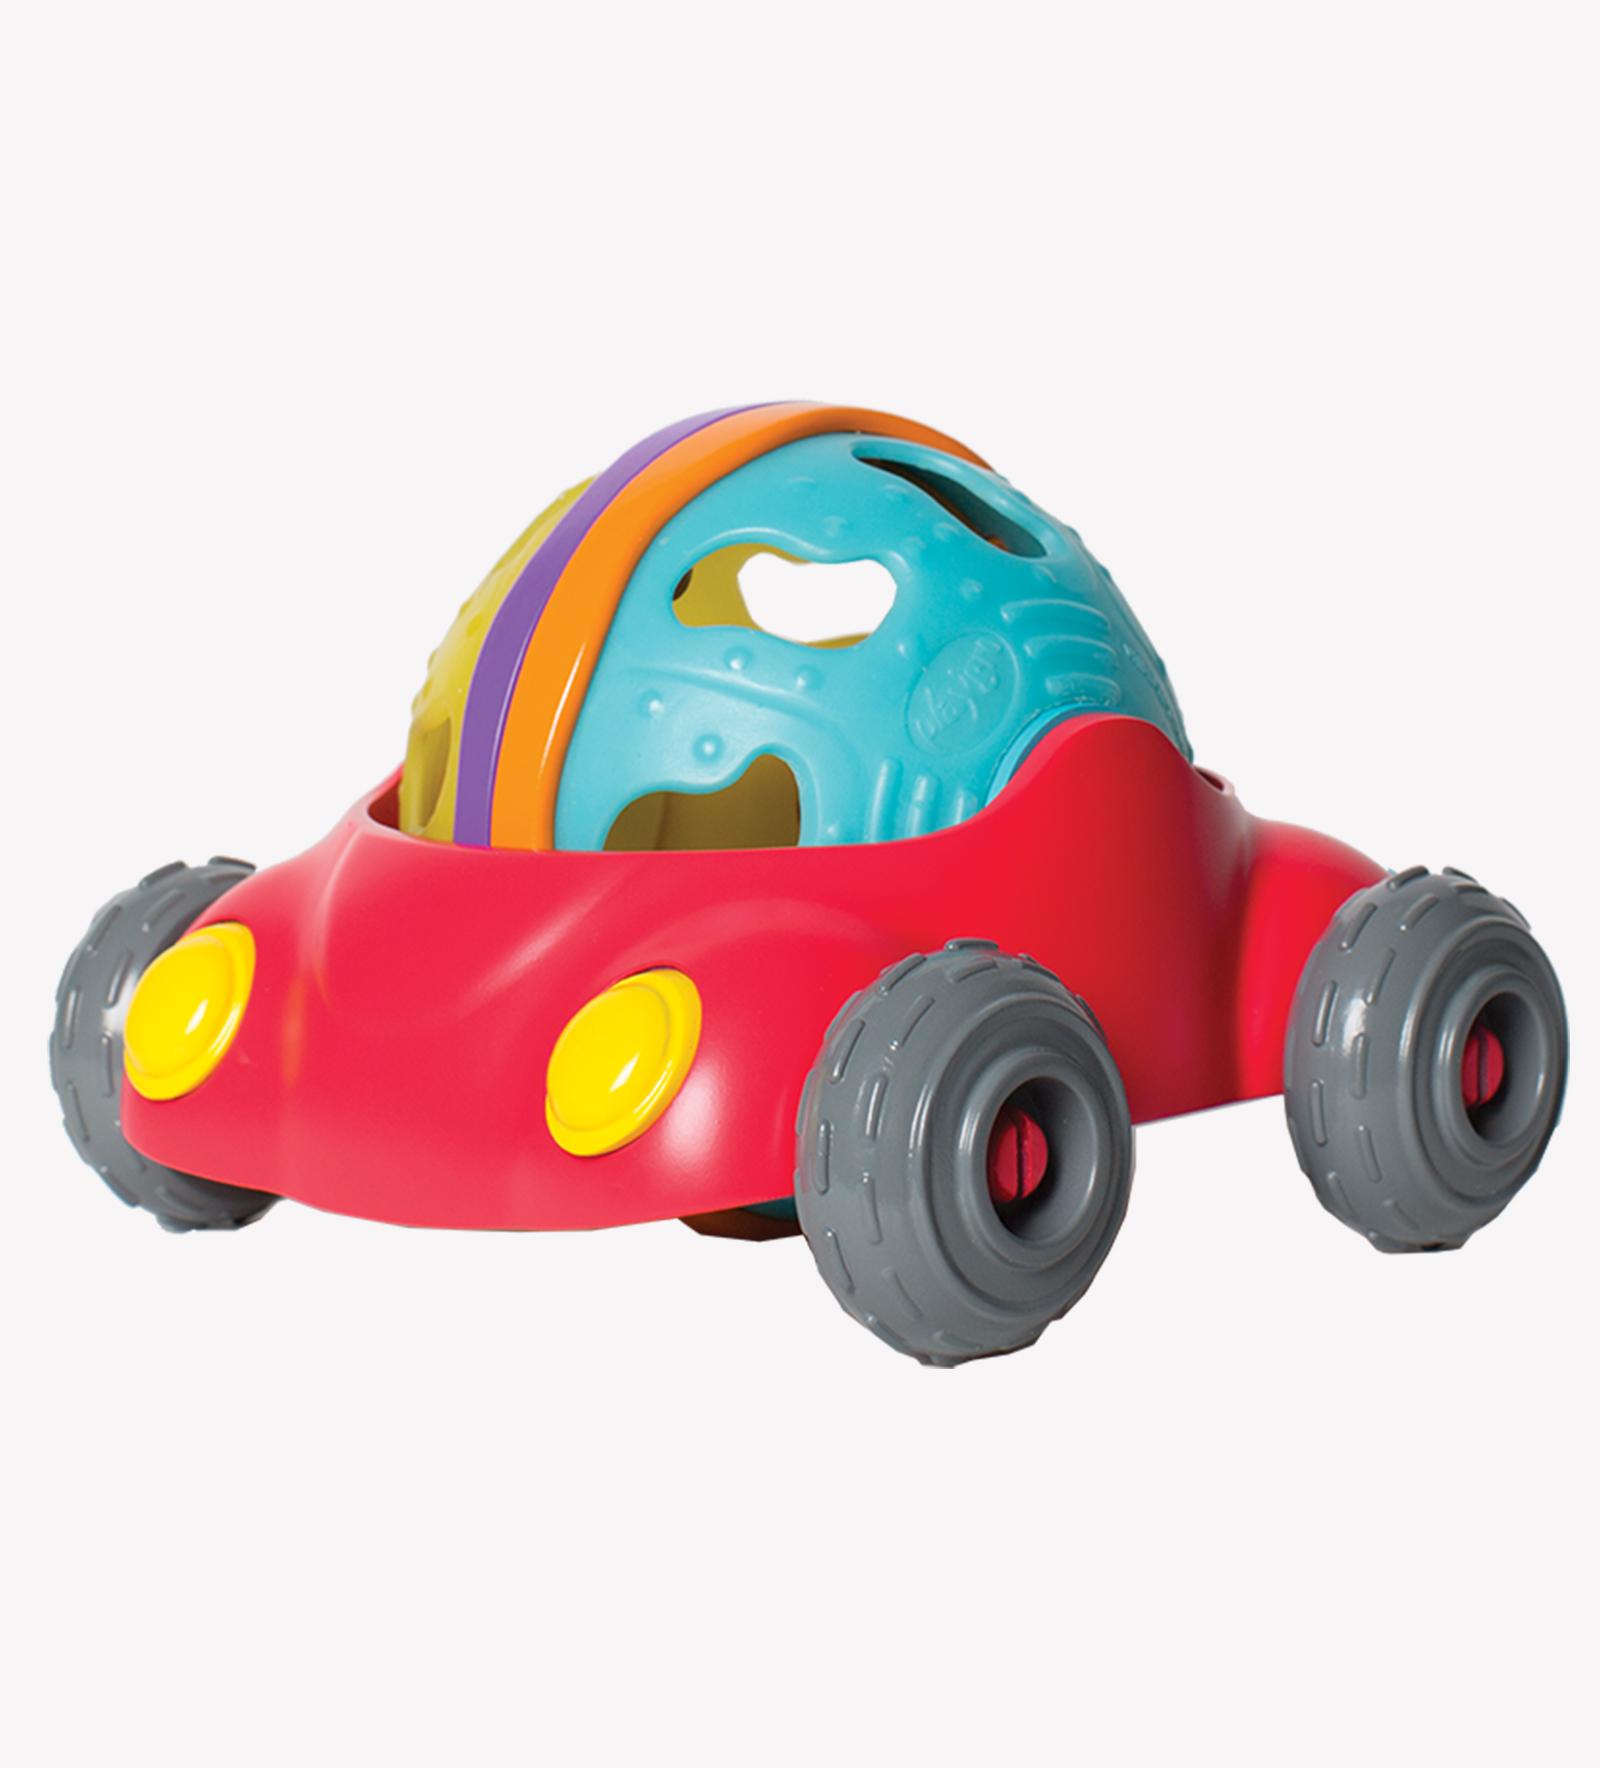 Rattle & Roll Car